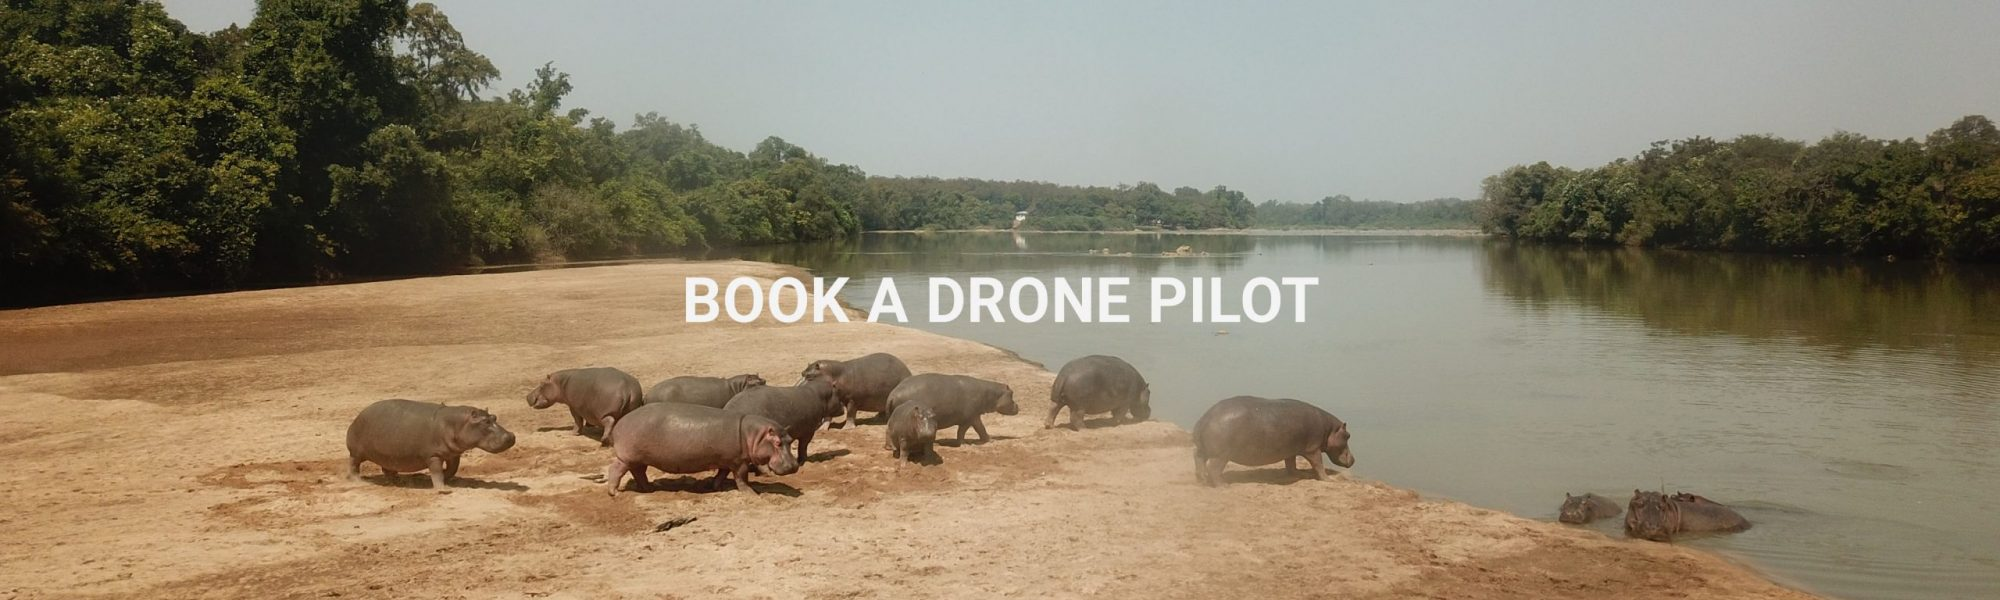 Book a drone pilot